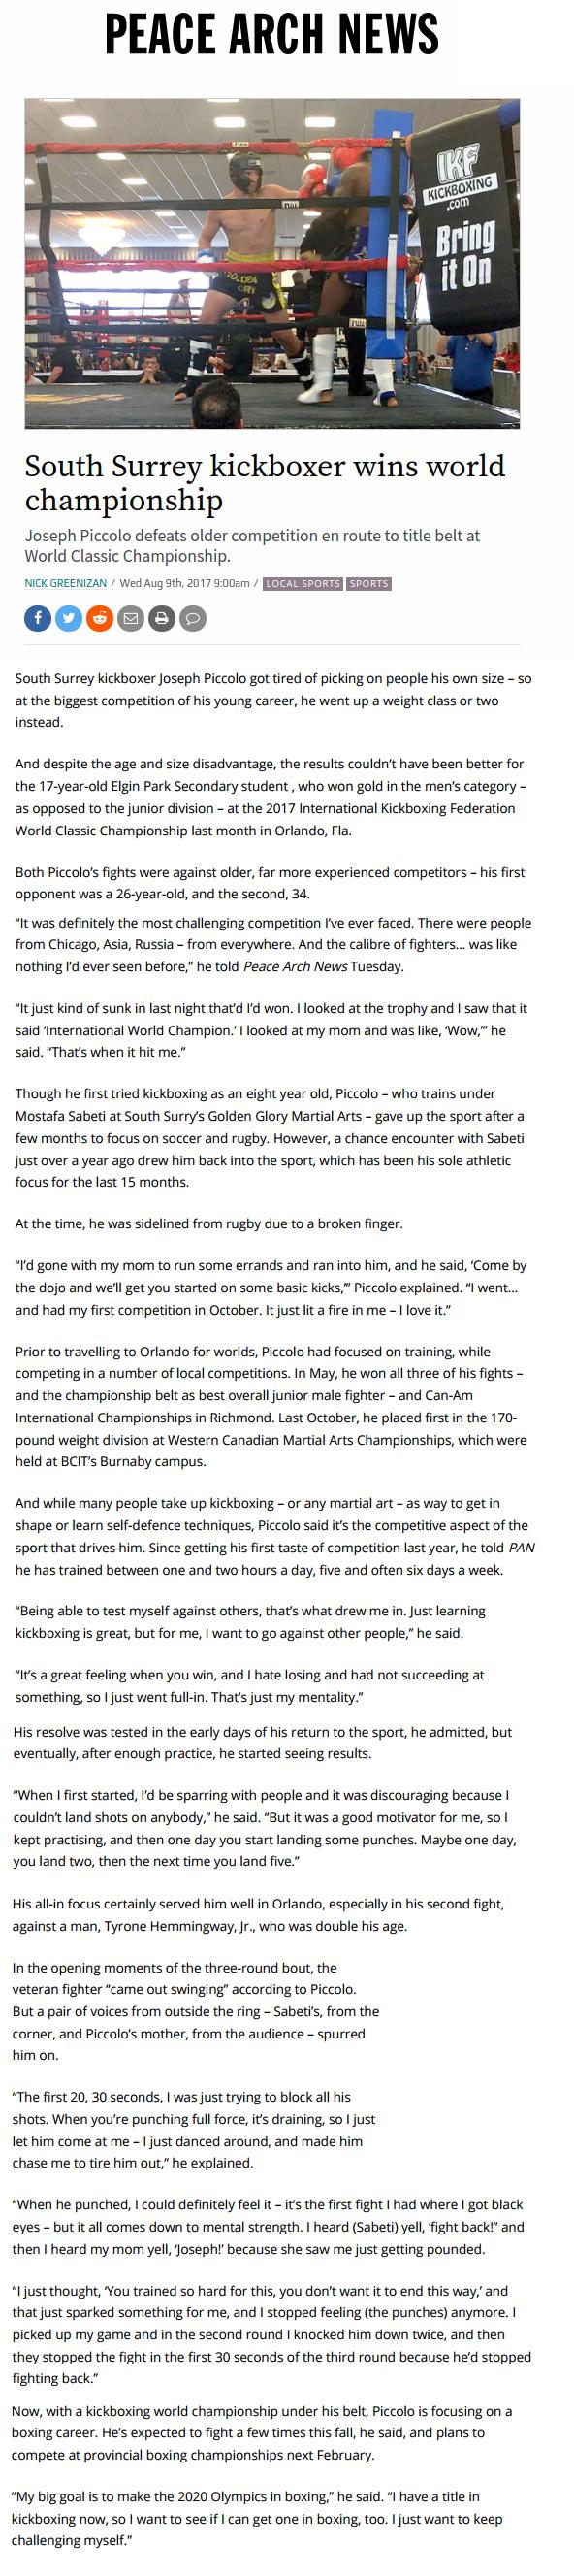 kickboxing_championship_article